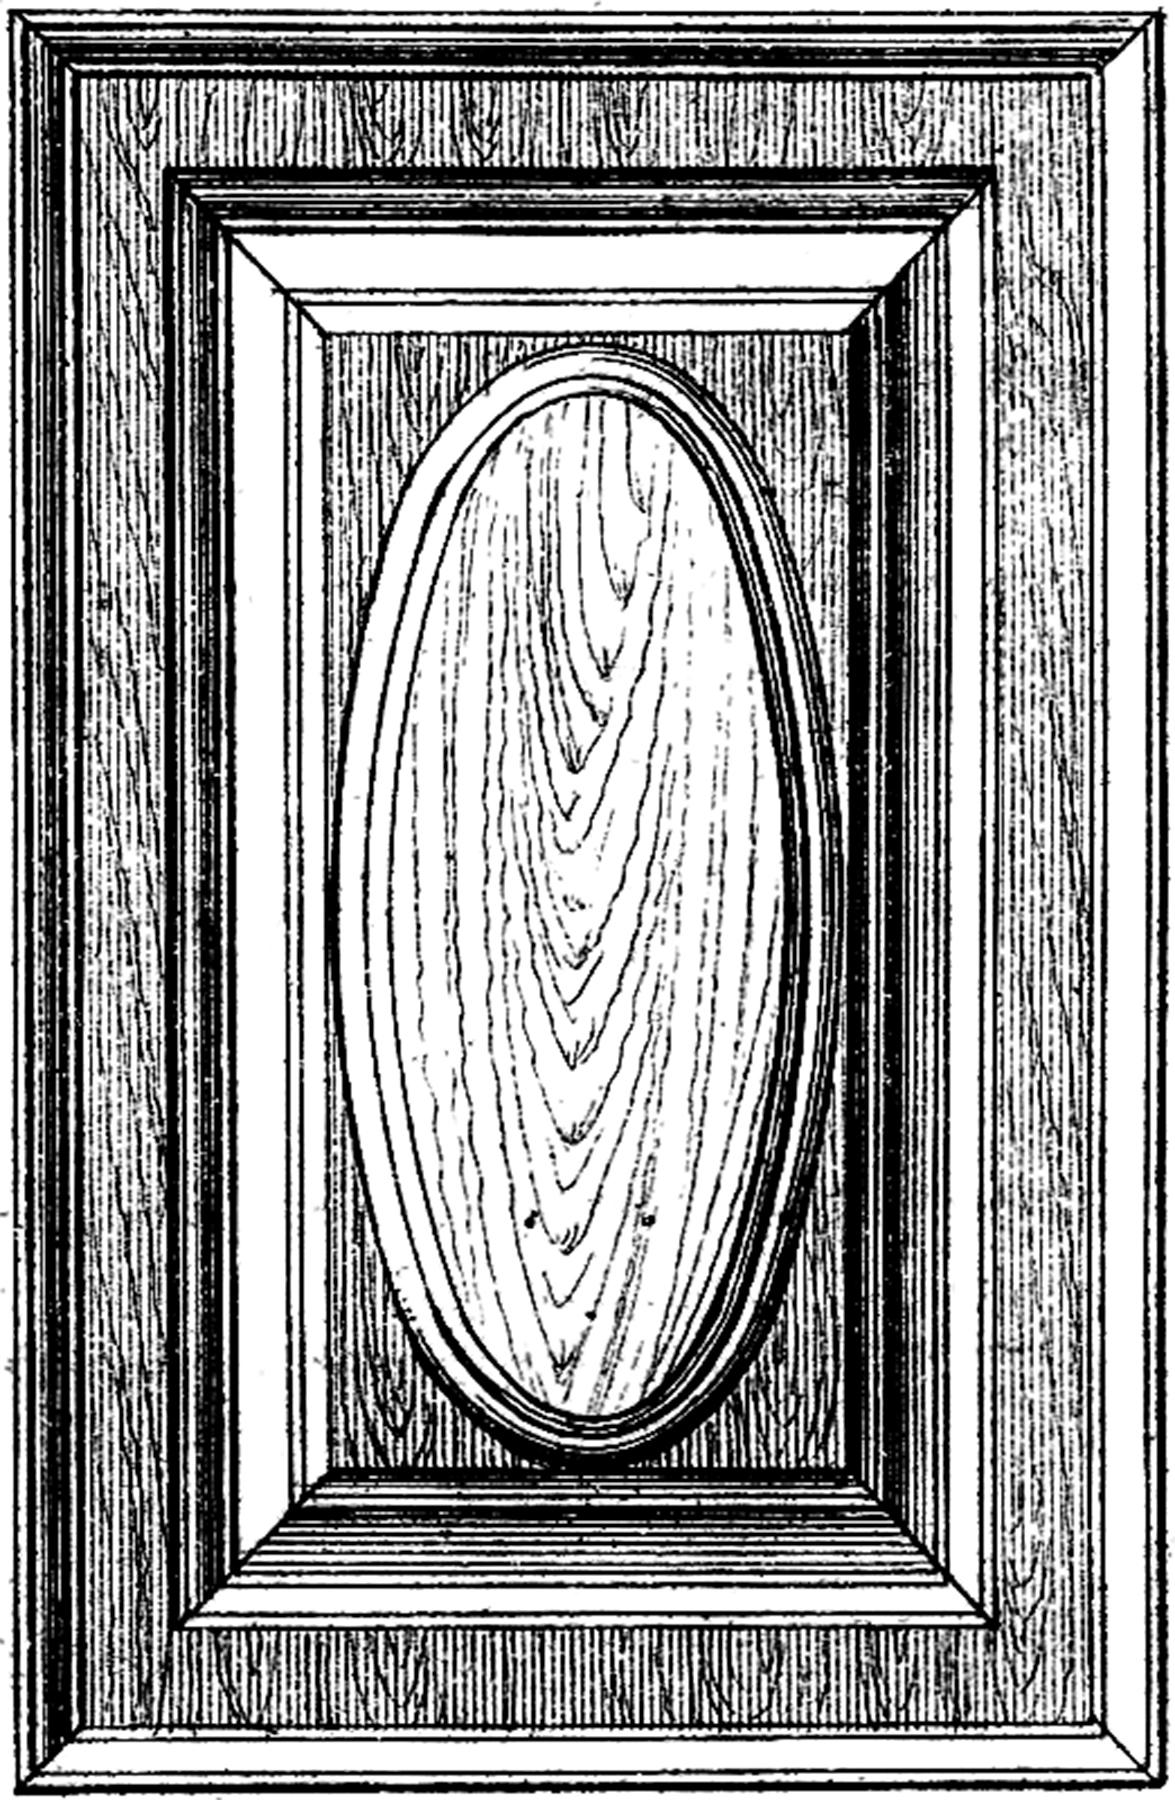 Antique Wood Paneling: 3 Vintage Wood Grain Panel Images!